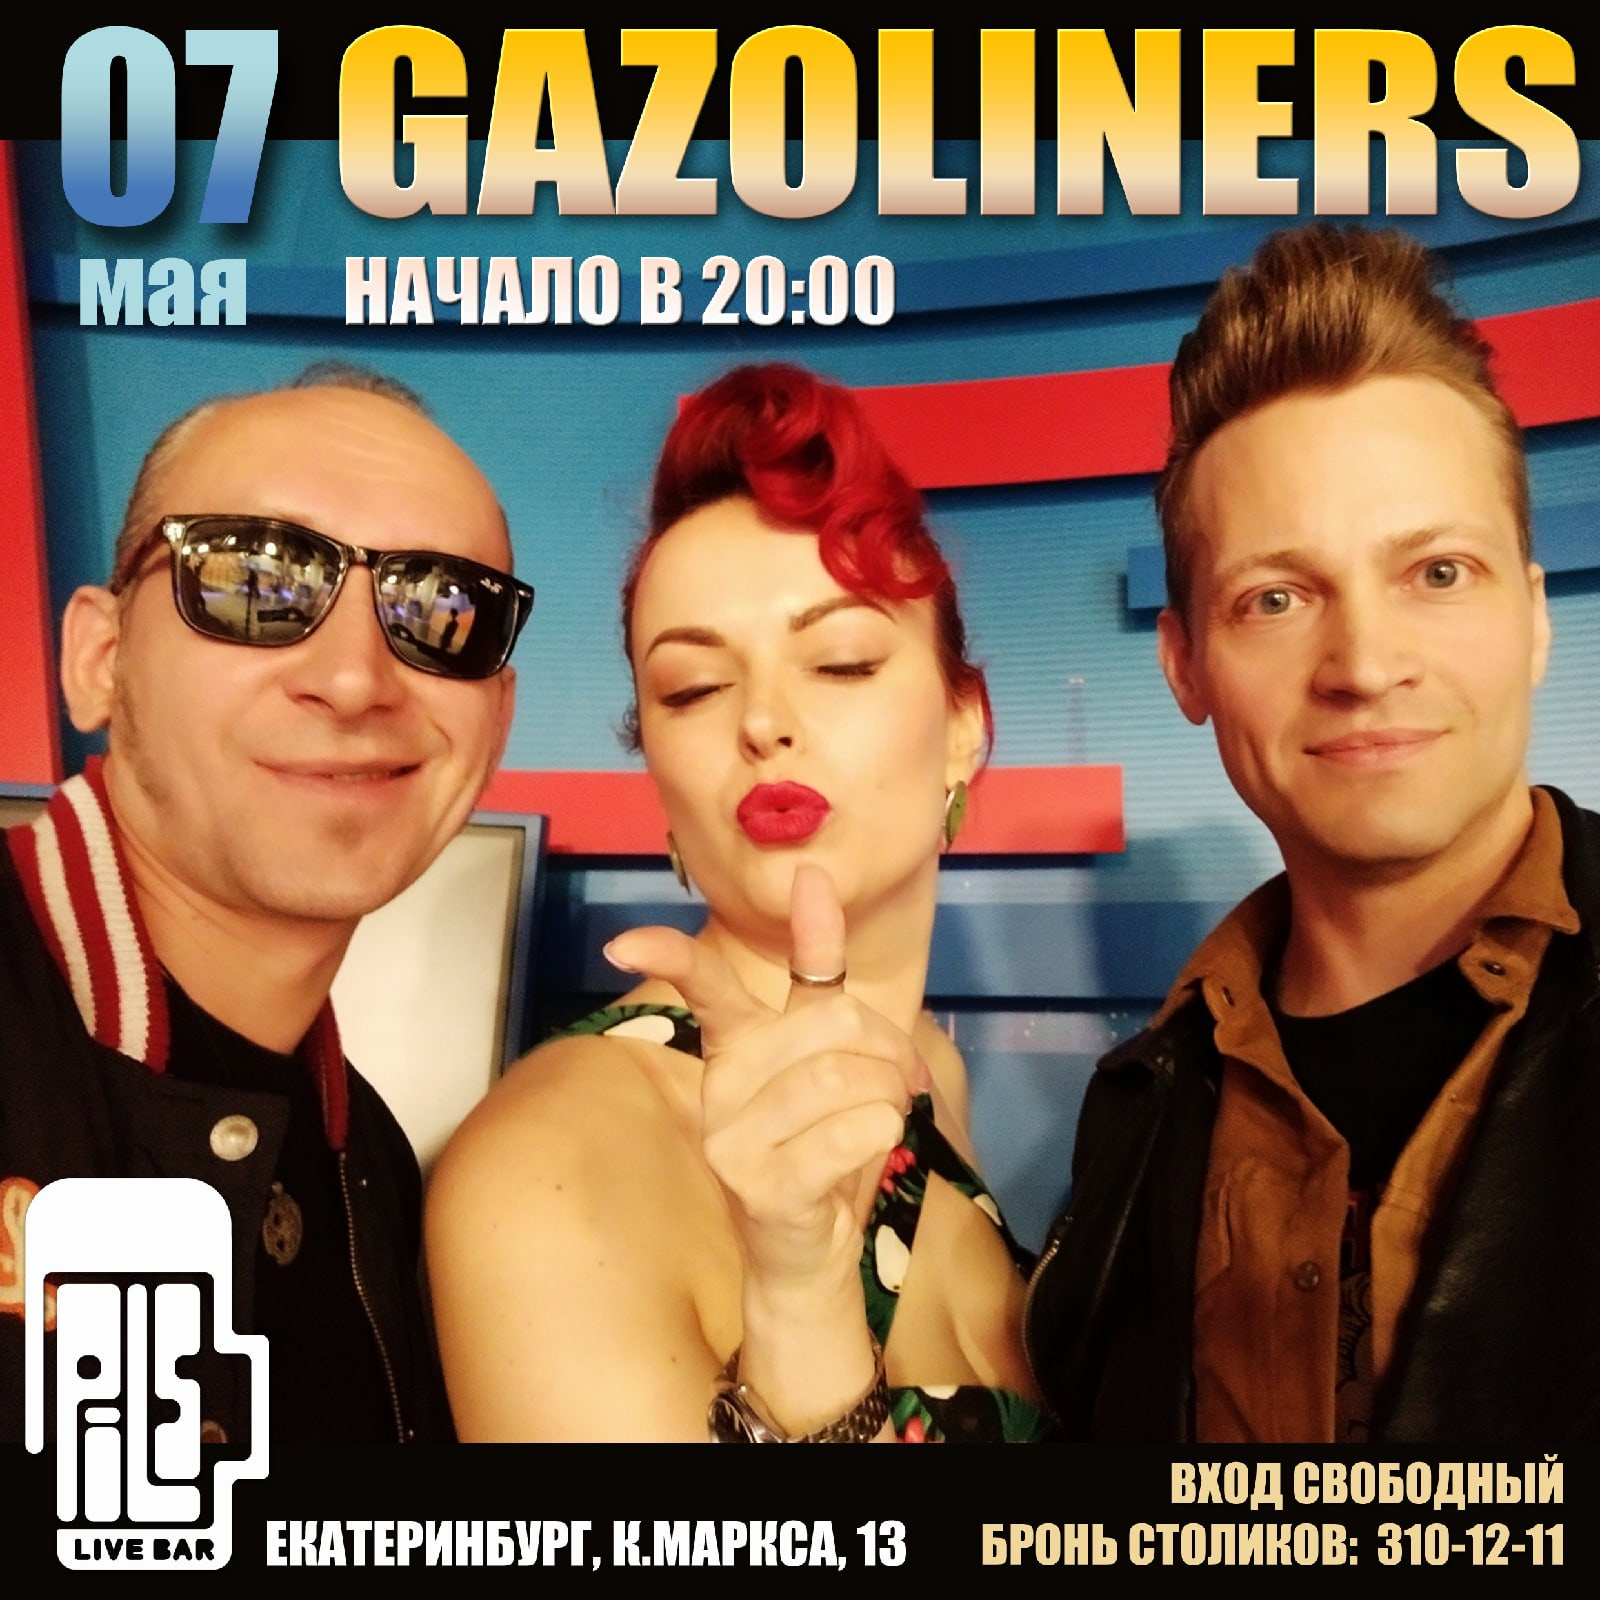 07.05 Gazoliners в Pils Live Bar!